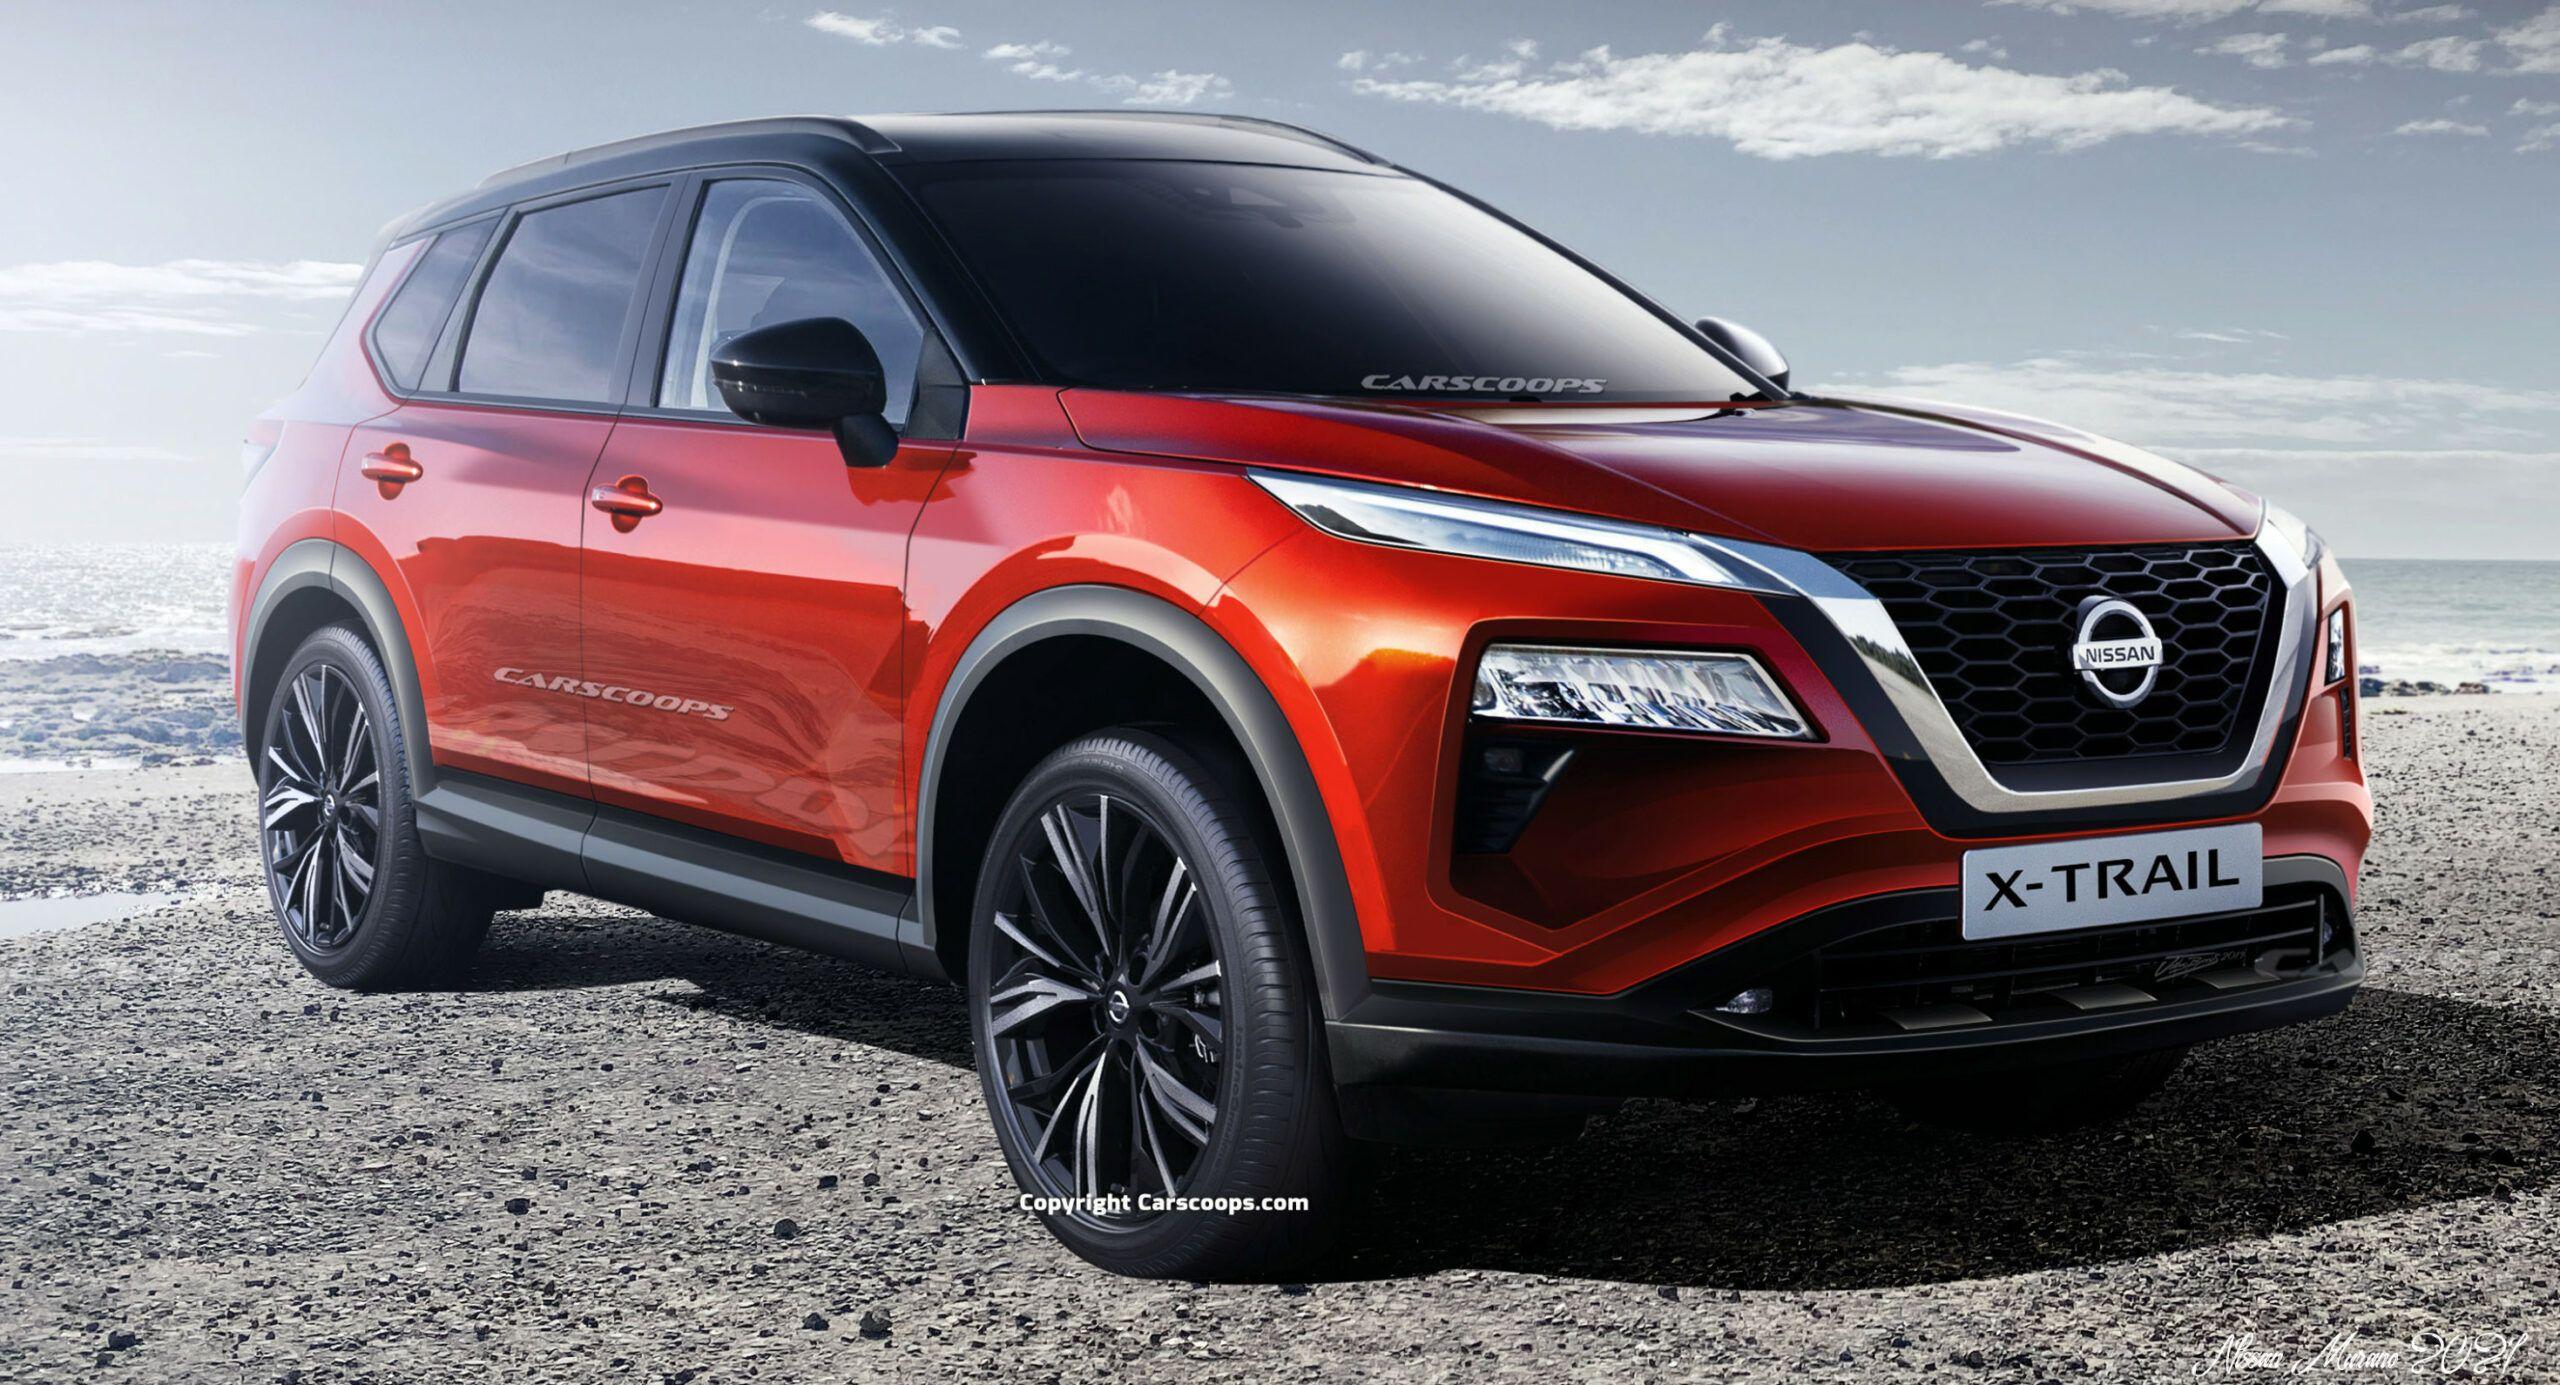 Nissan Murano 2021 Reviews In 2020 Nissan Rogue Nissan Armada Nissan